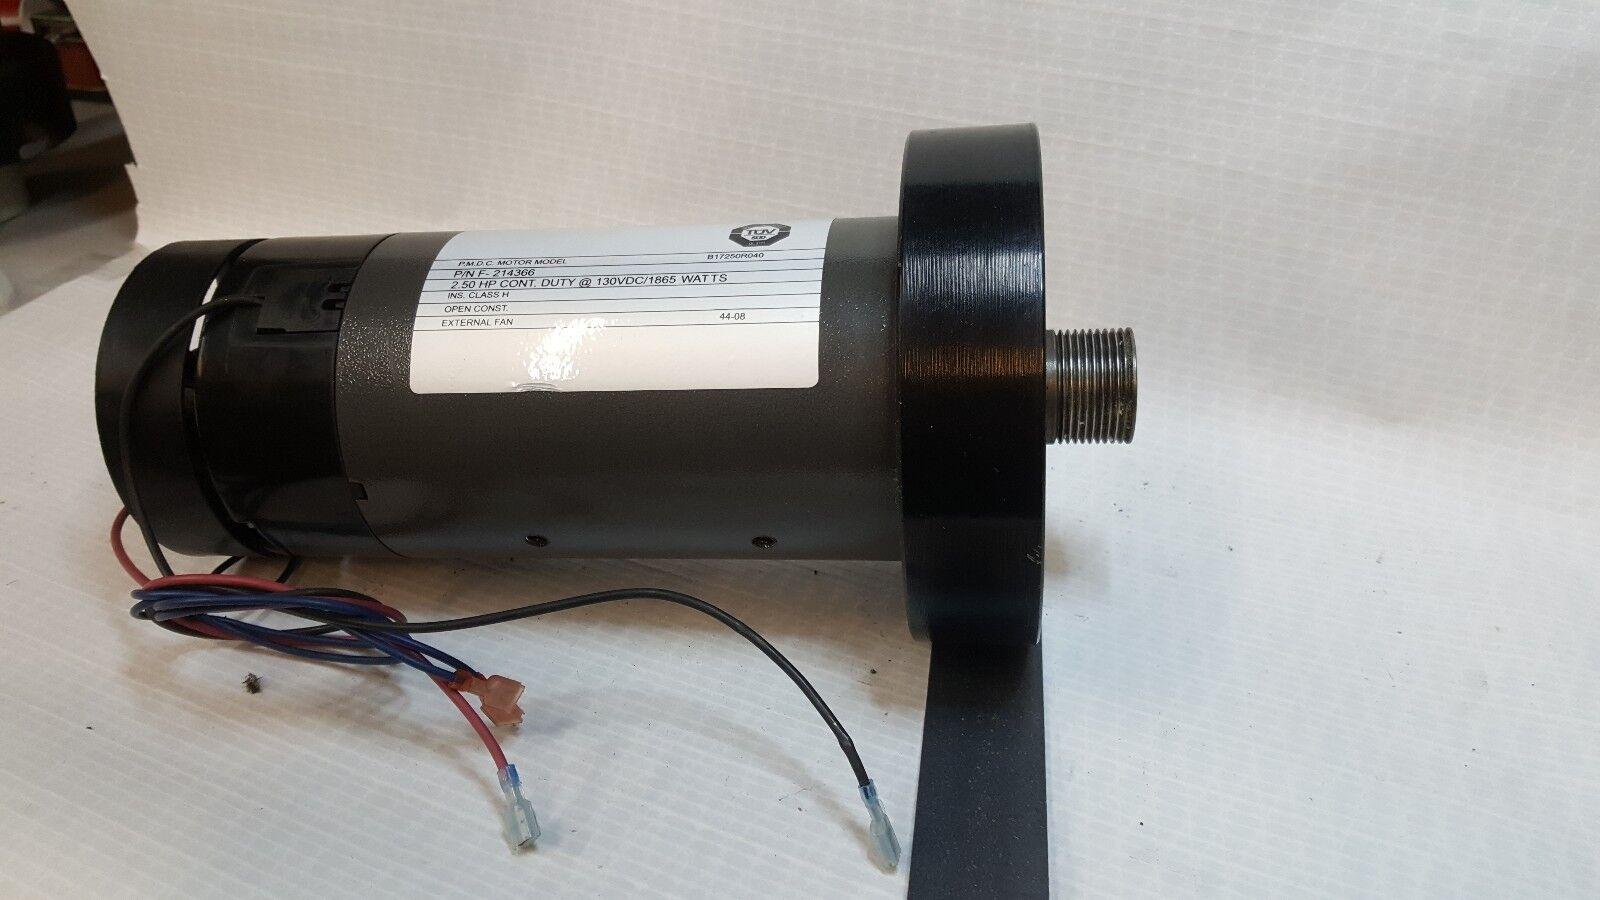 Used Treadmill Motor, Wind Turbine, Permanent Magnet, Magnet, Permanent 214366 d541c9